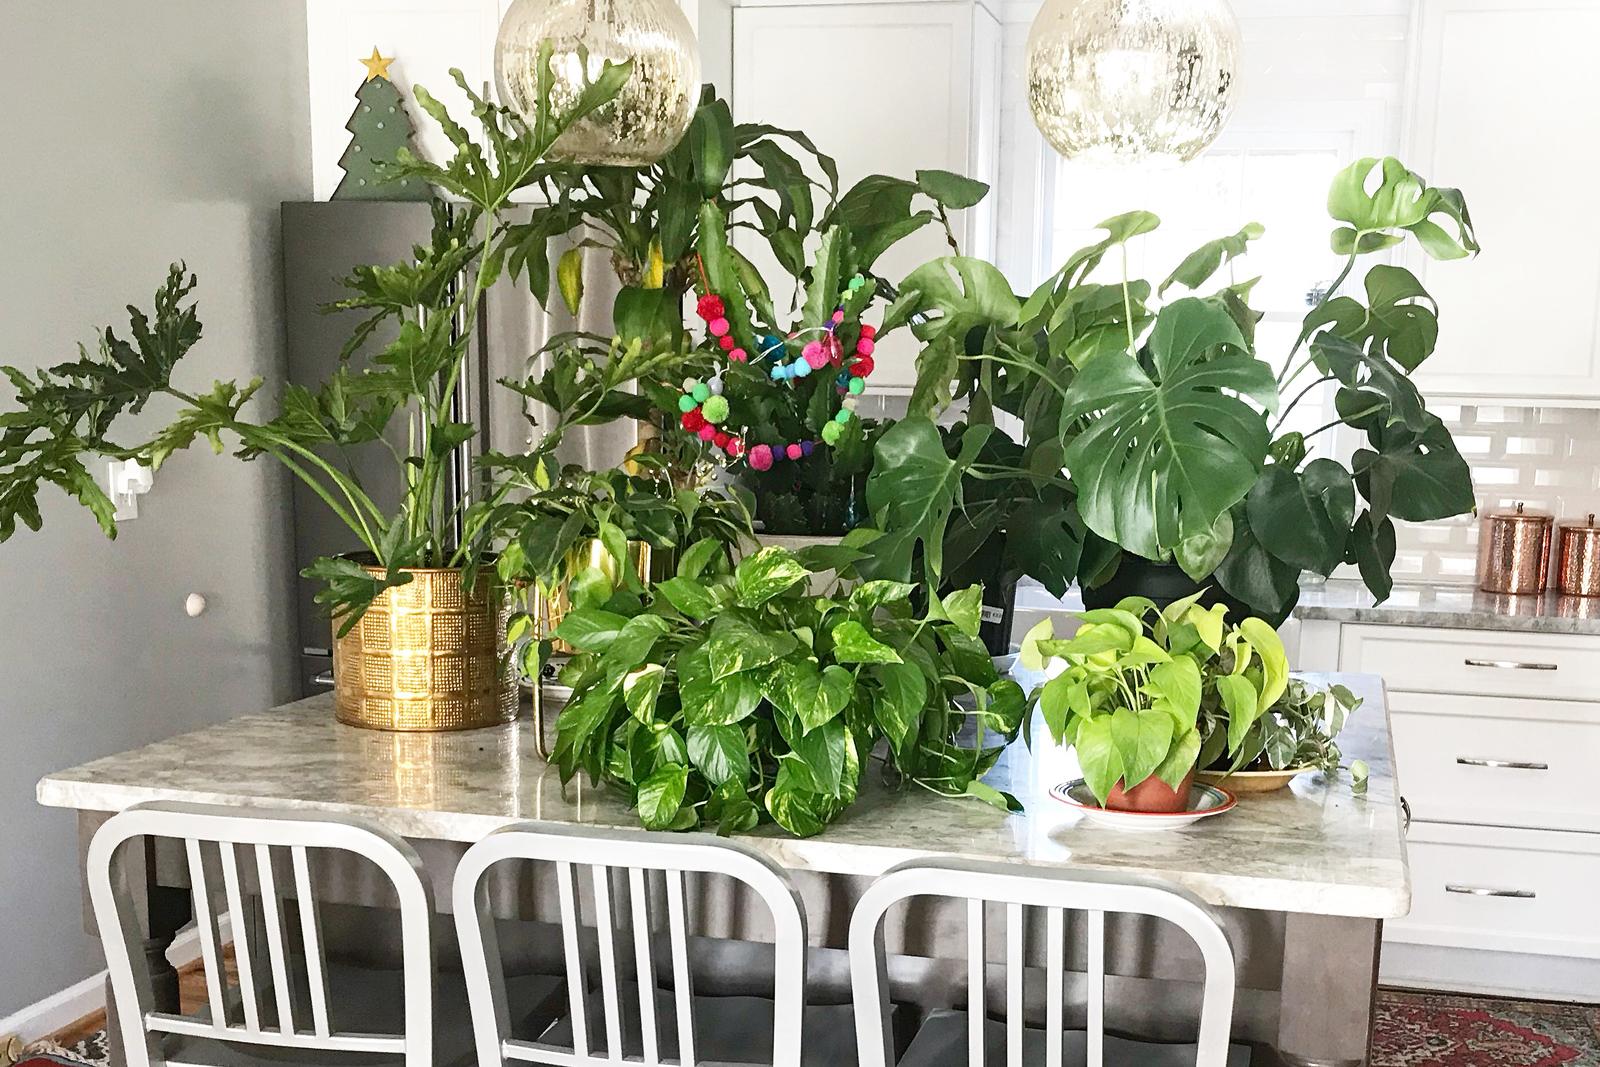 A few houseplants on a marble kitchen countertop